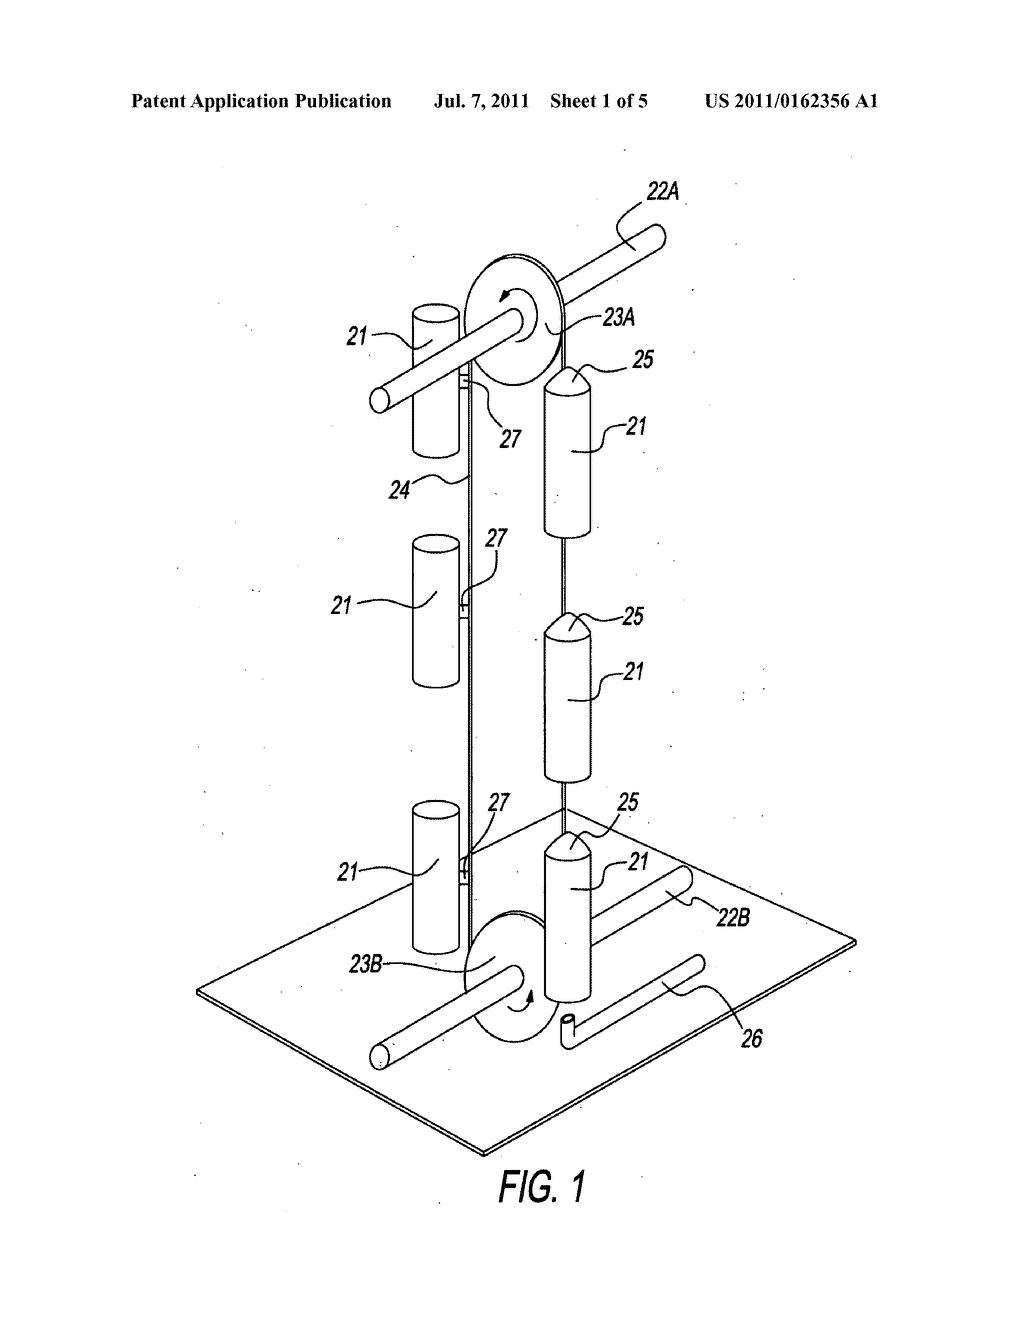 rotational gravity buoyancy power generator diagram, schematicrotational gravity buoyancy power generator diagram, schematic, and image 02